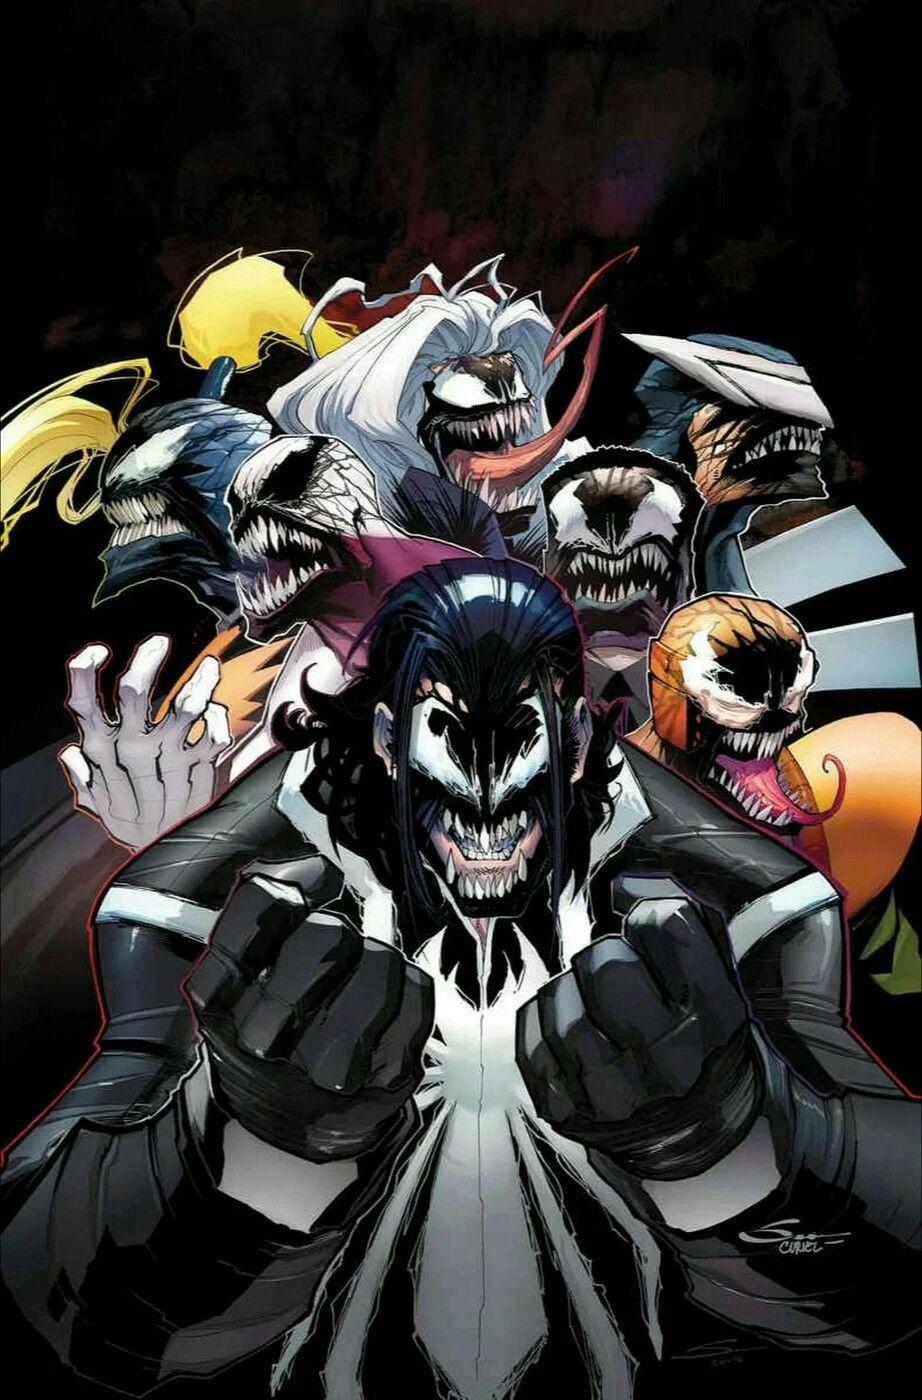 Pin de Sweendog en Venom | Pinterest | Hombre araña, Imagenes chidas ...